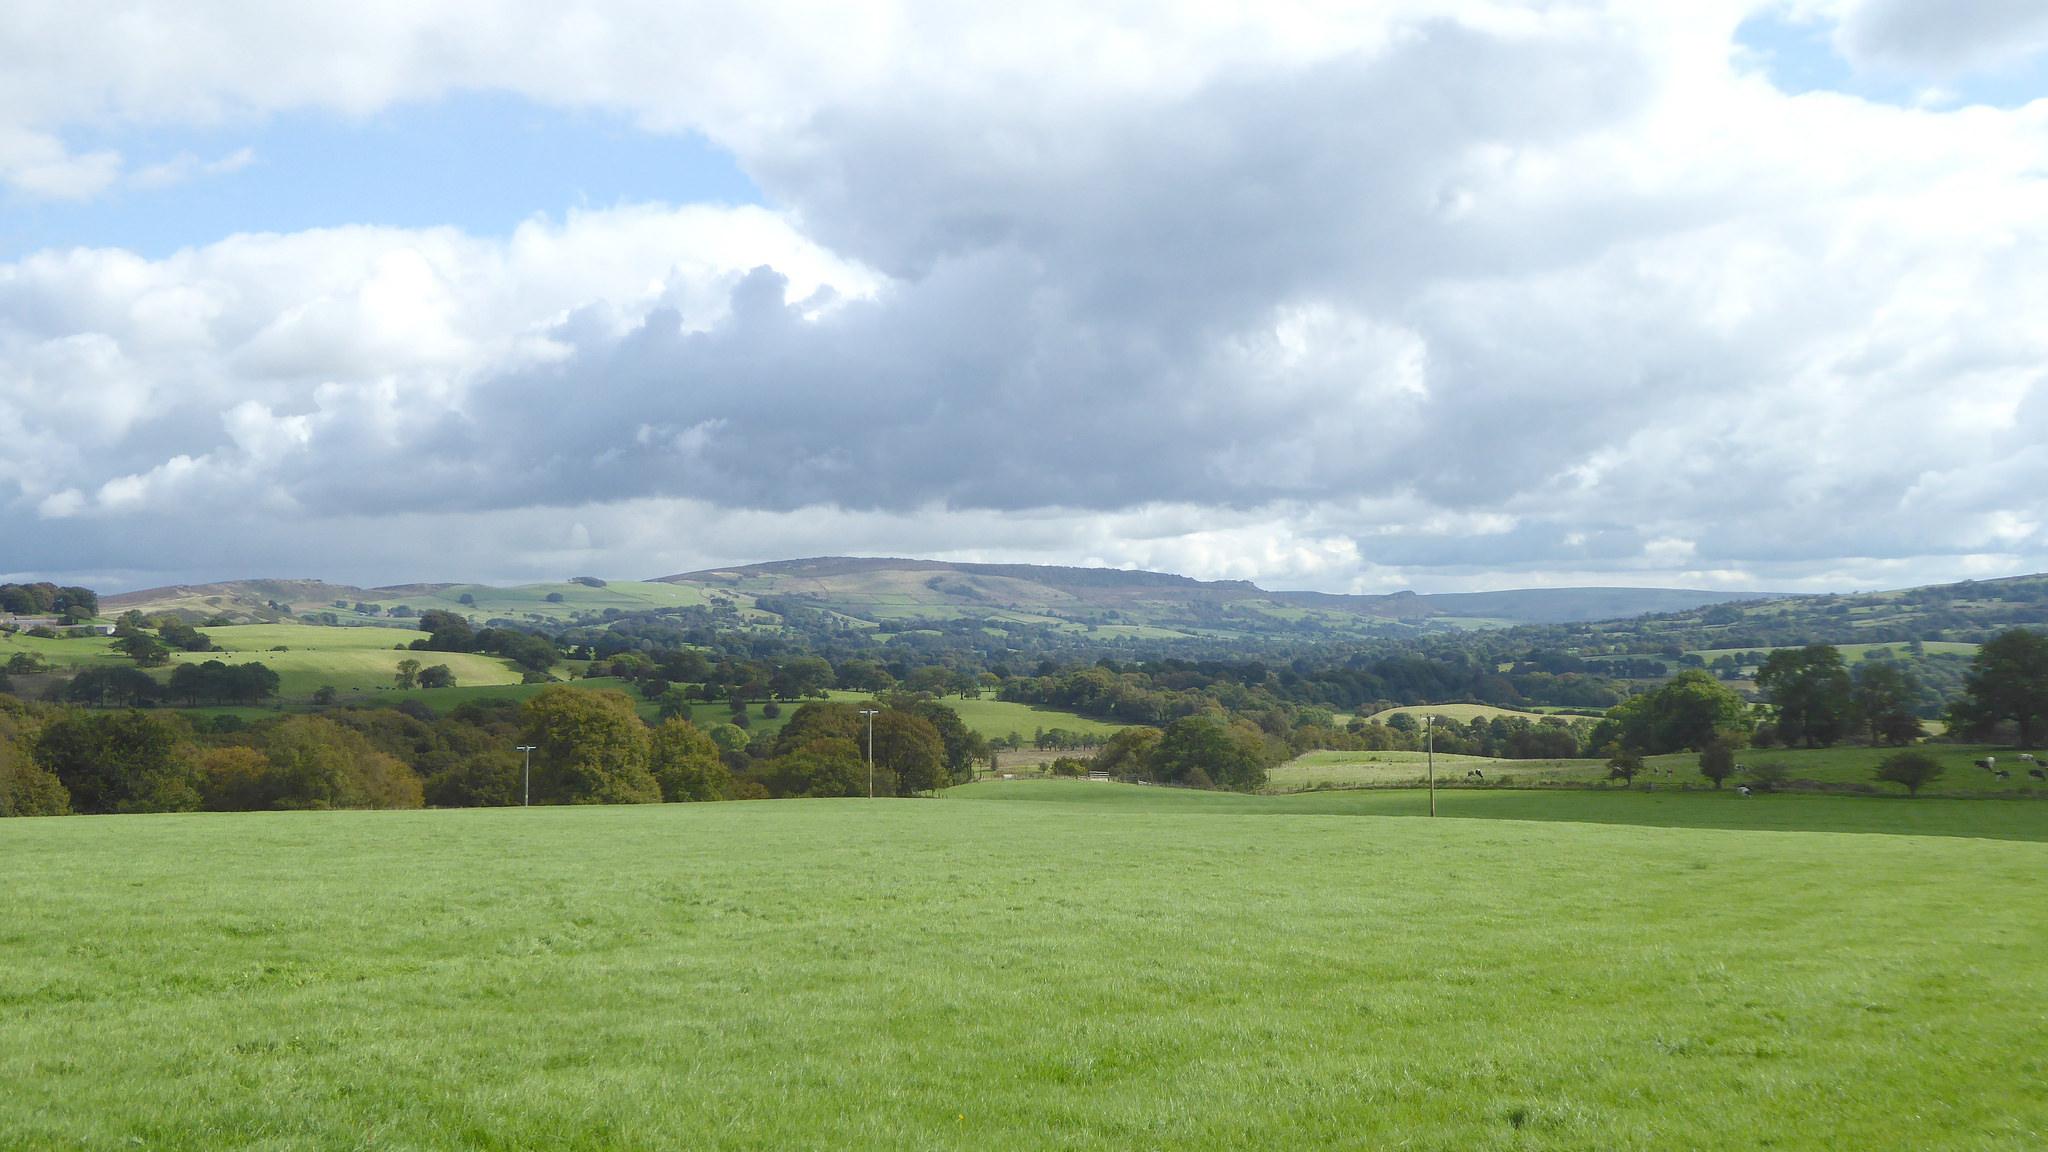 View of fields near the village of Hawkslee